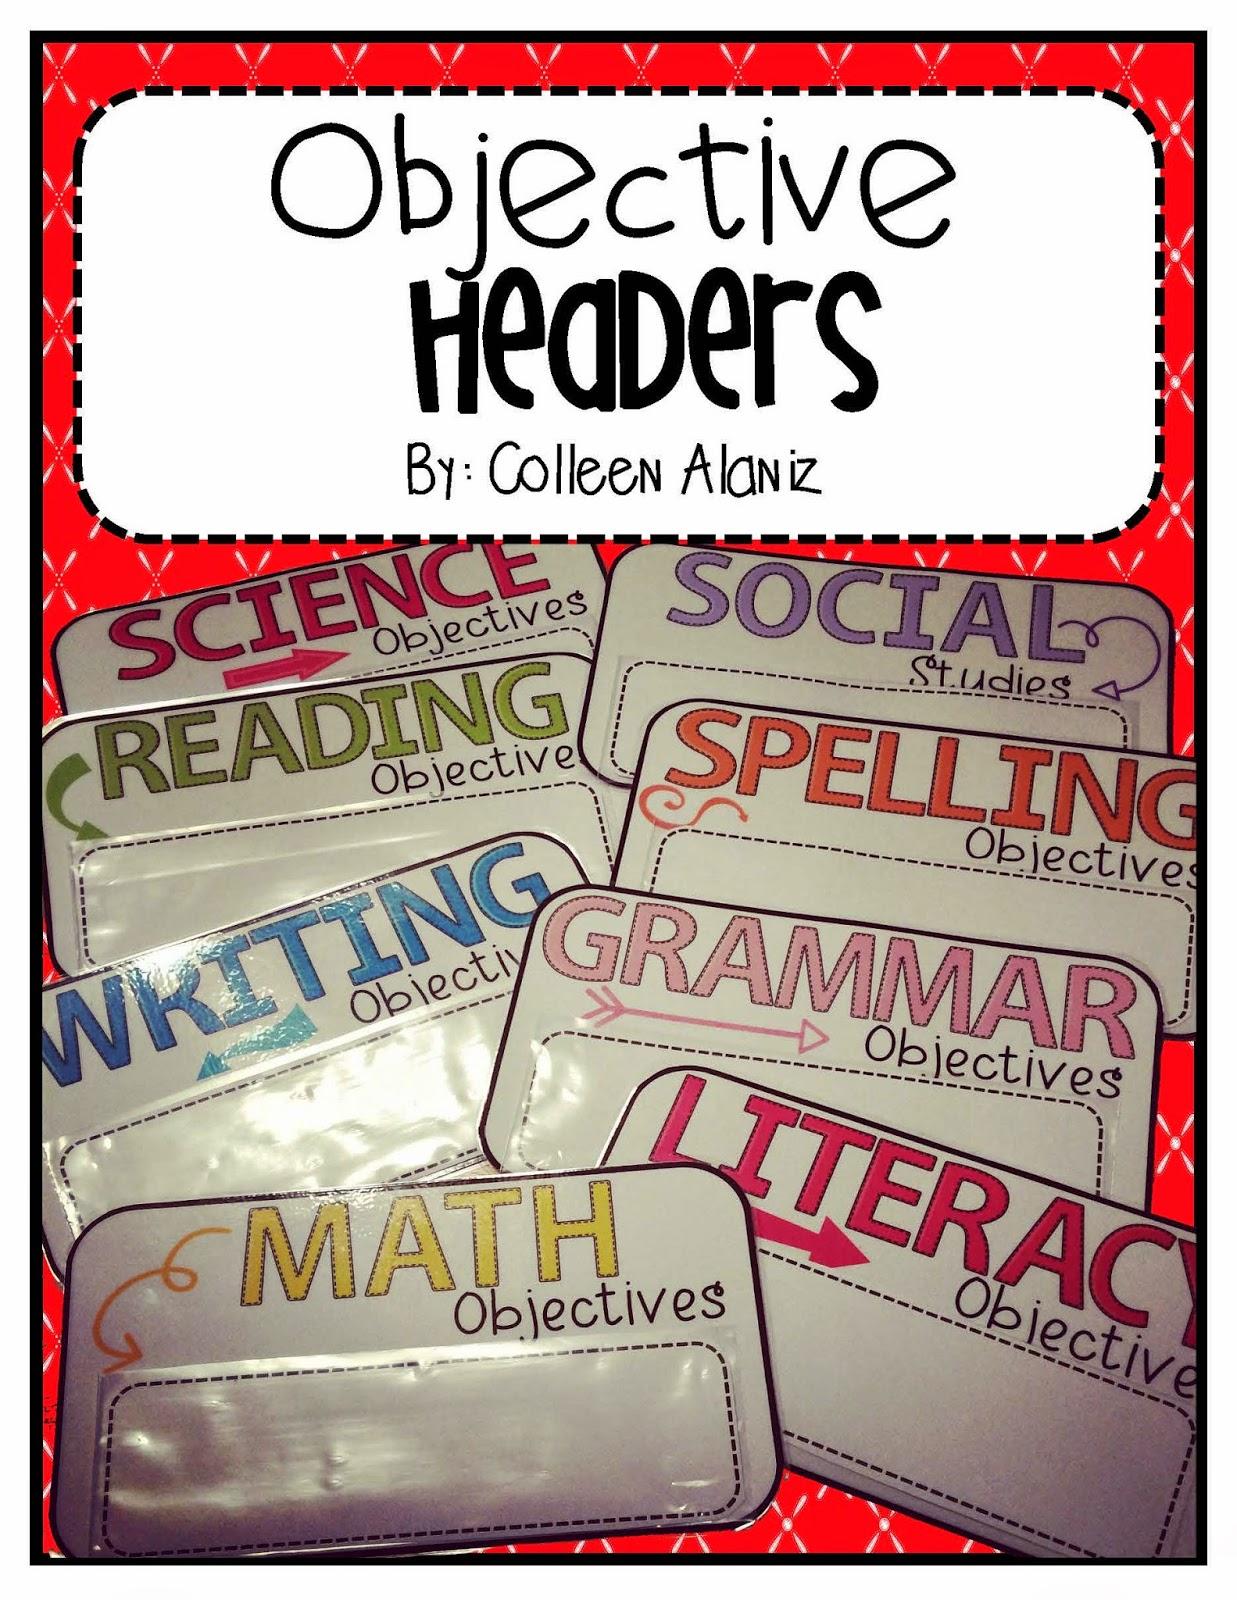 http://www.teacherspayteachers.com/Product/Objective-Headers-Color-Splash-1434125